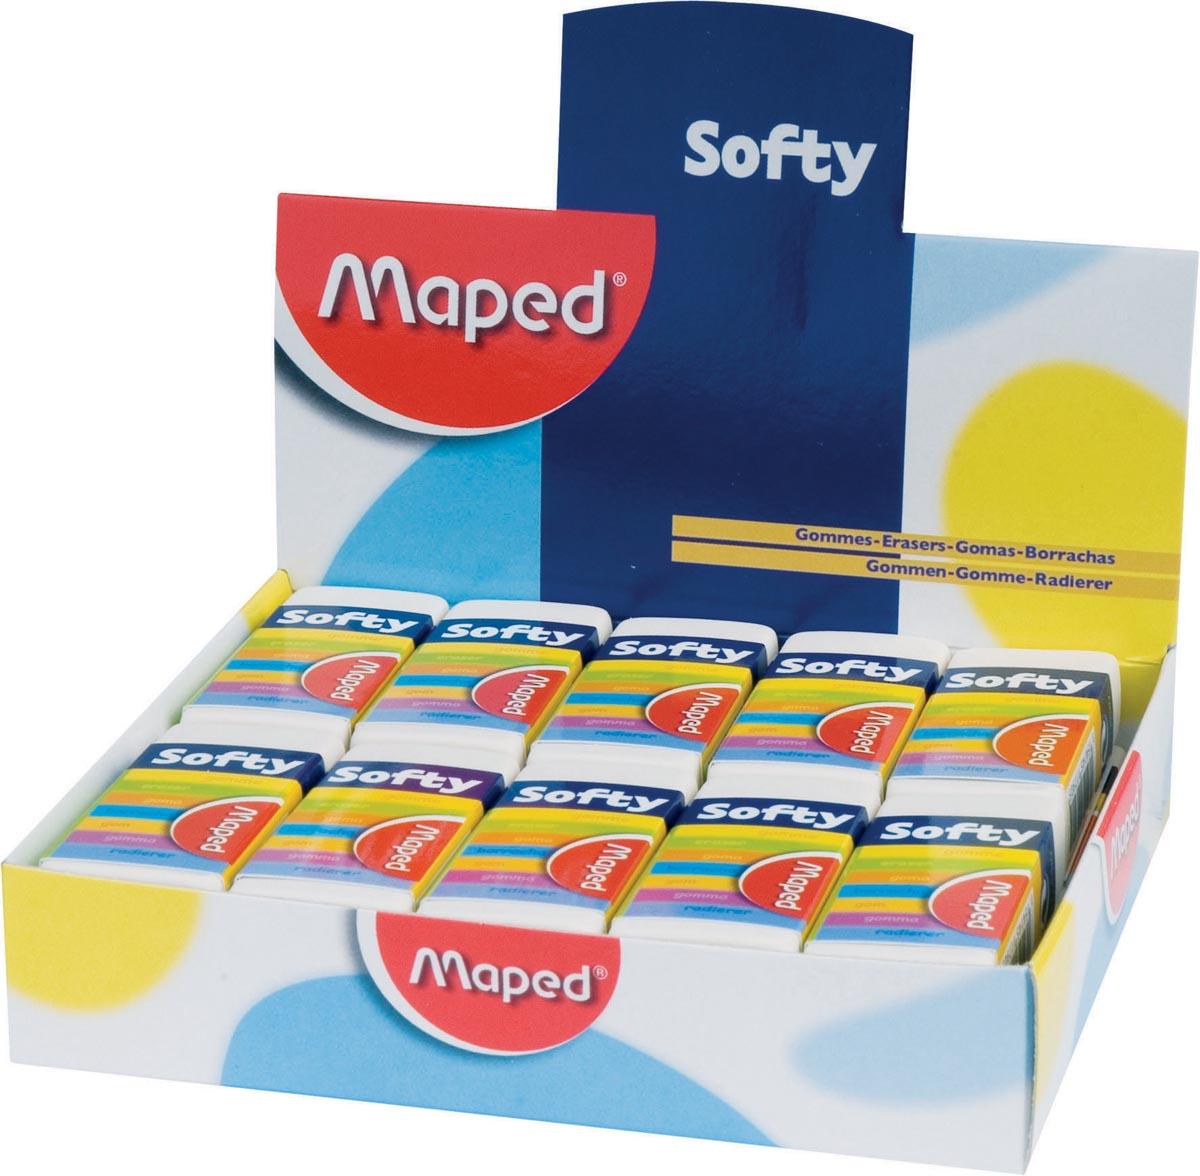 Maped potloodgom Softy medium formaat, doos van 20 stuks